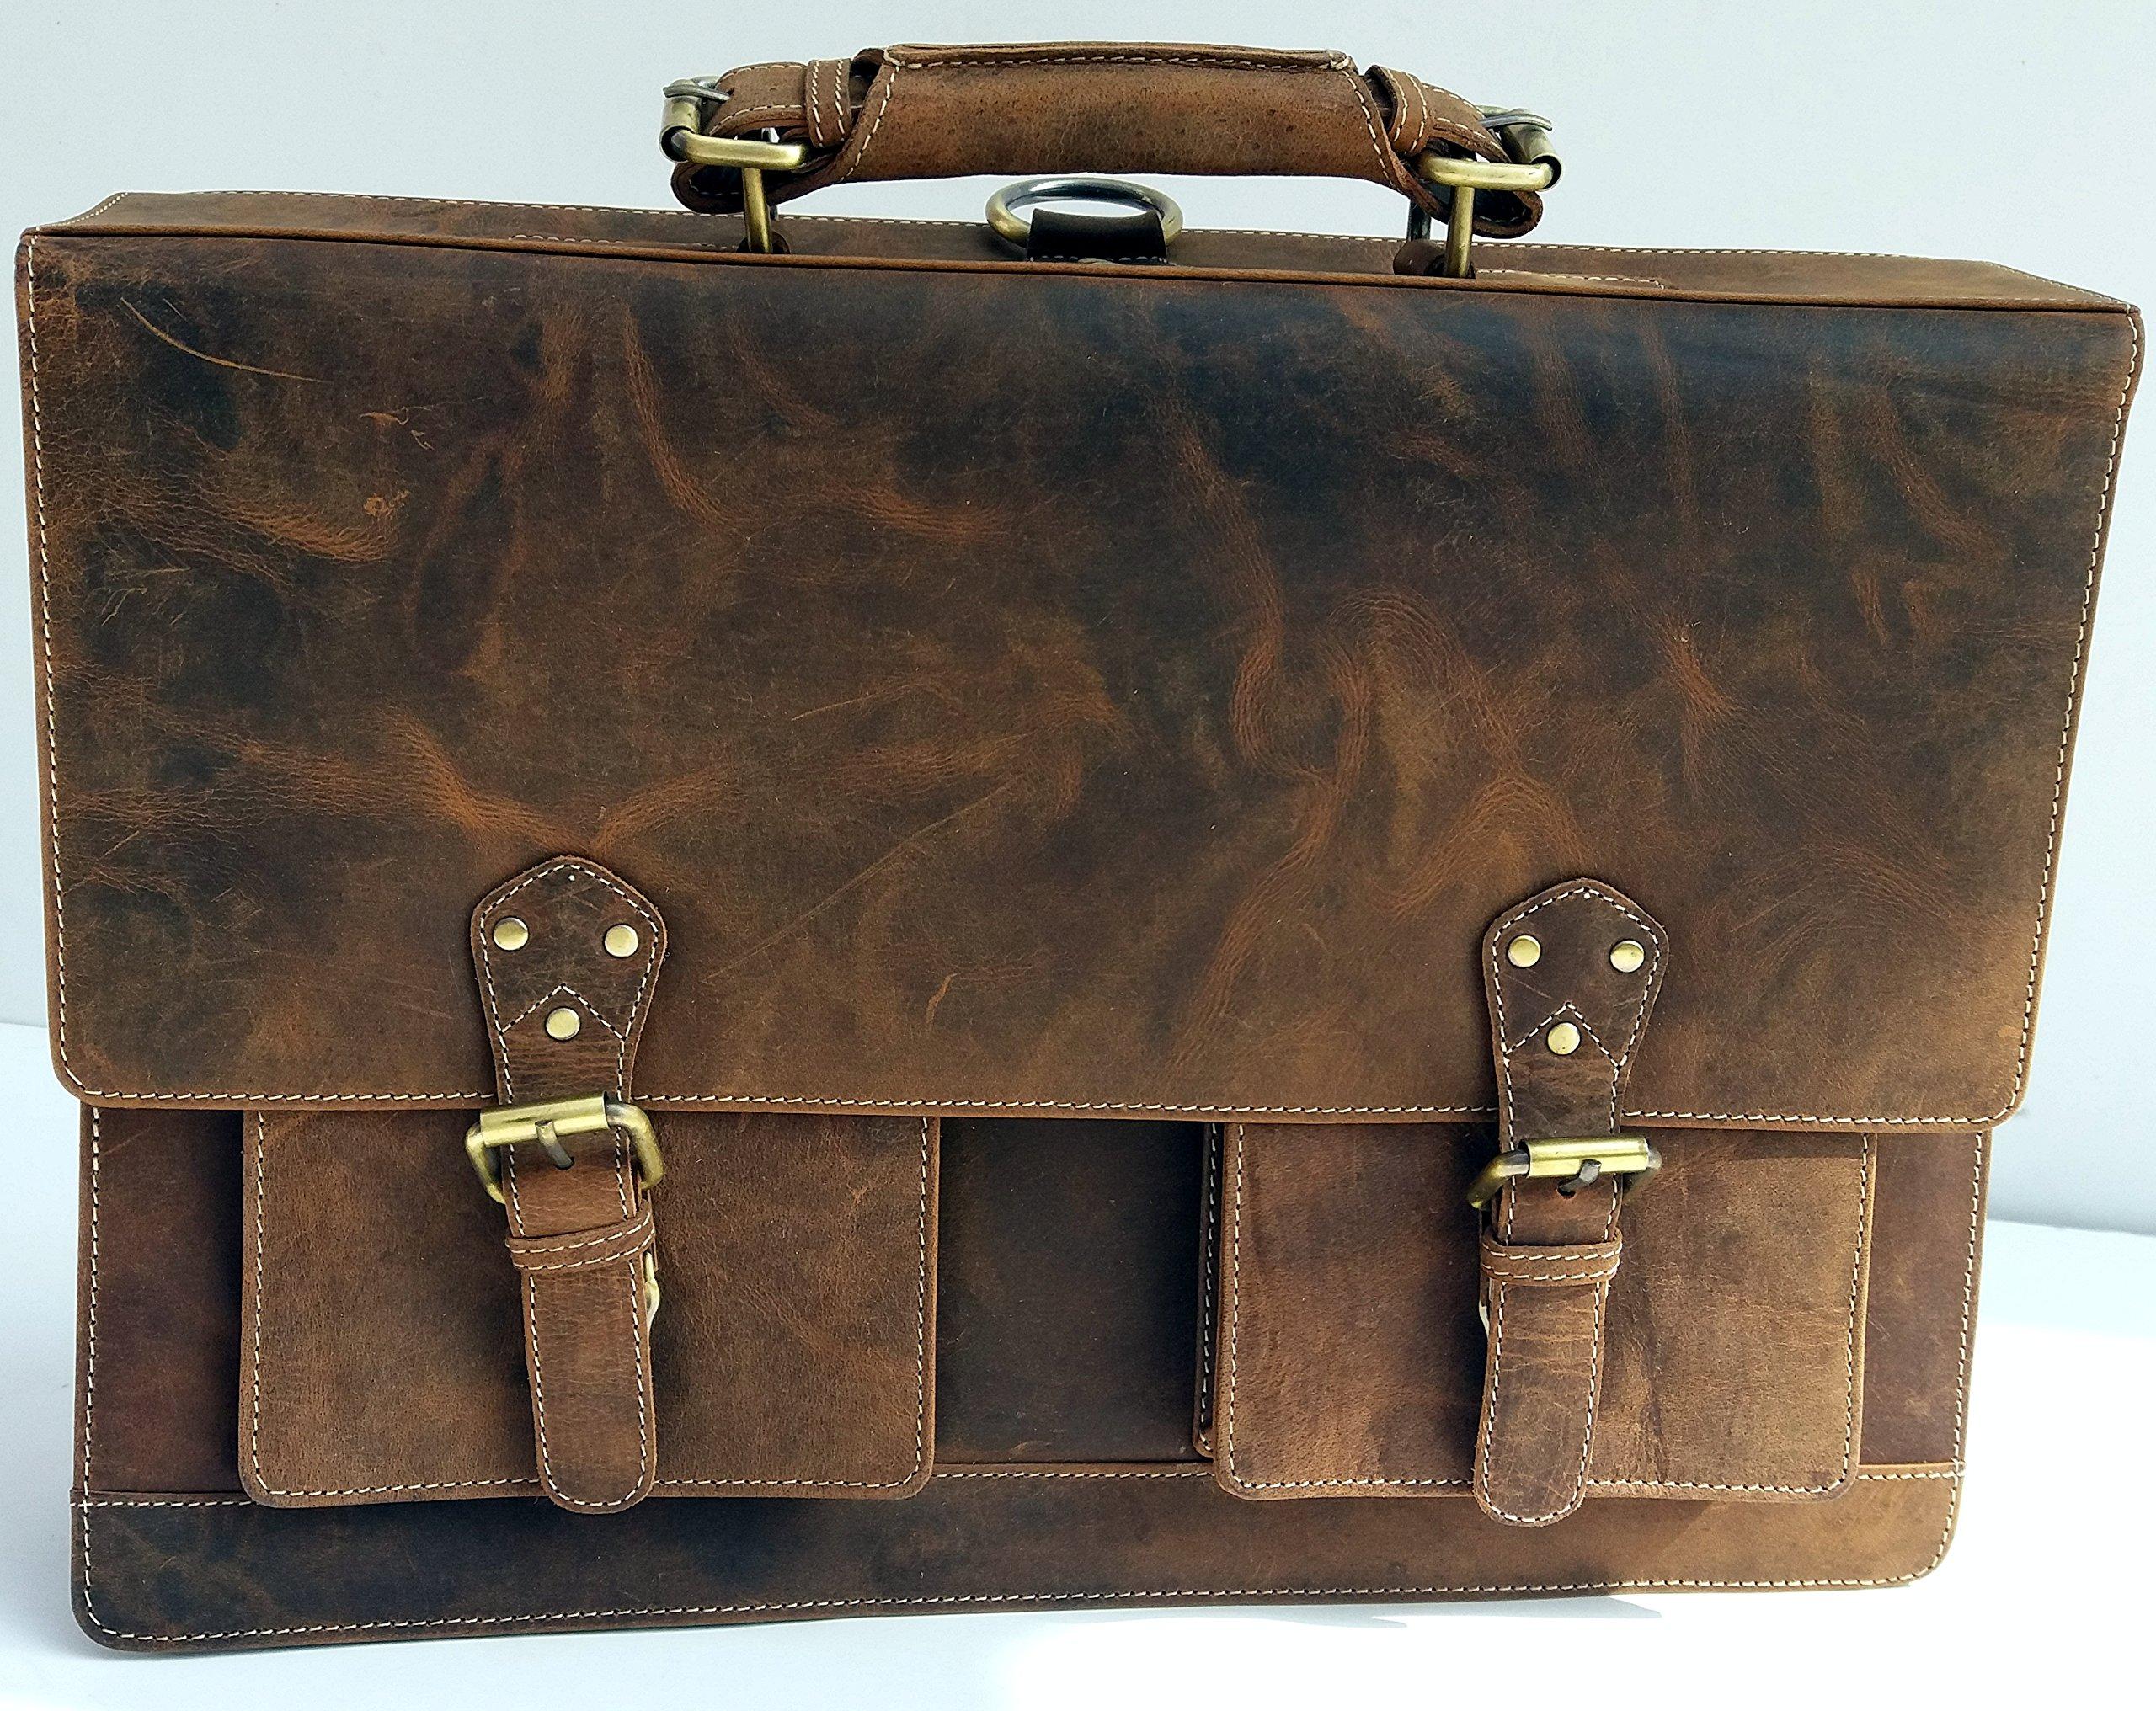 16 inch leather messenger briefcase shoulder laptop backpack bag for men and women by omansh by Omansh